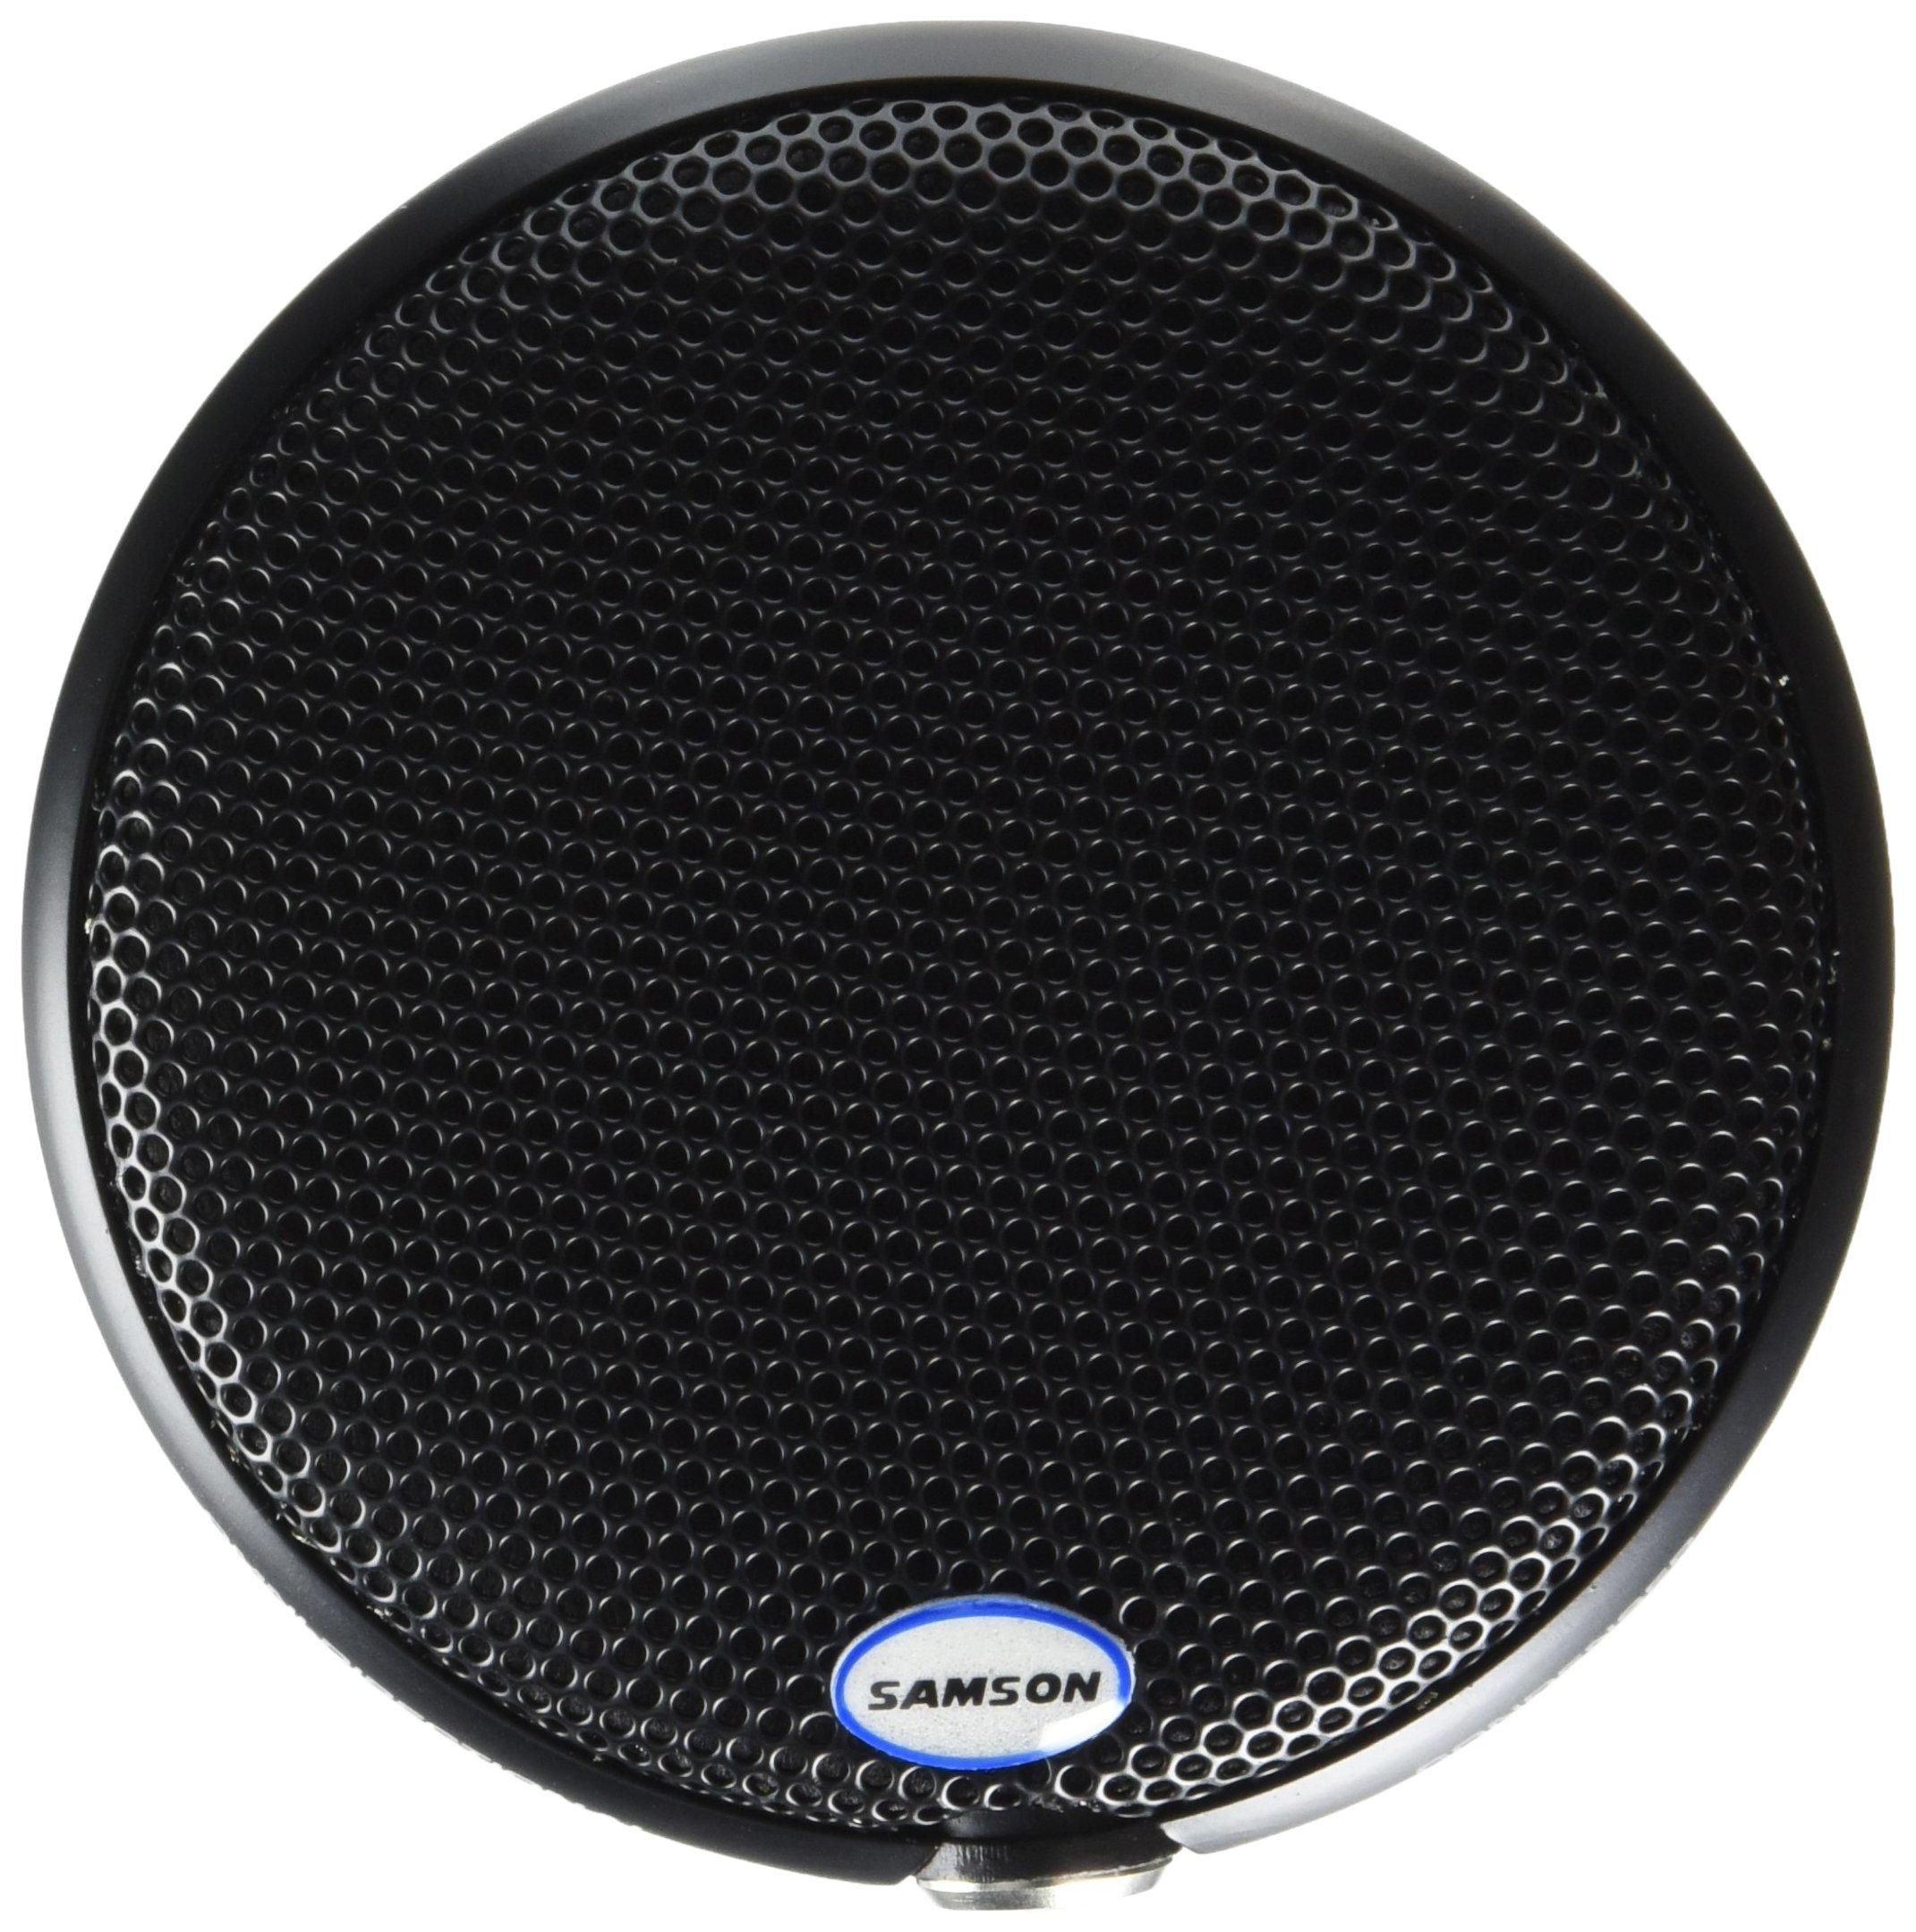 Microfono Samson CM11B Omnidirectional Boundary ...